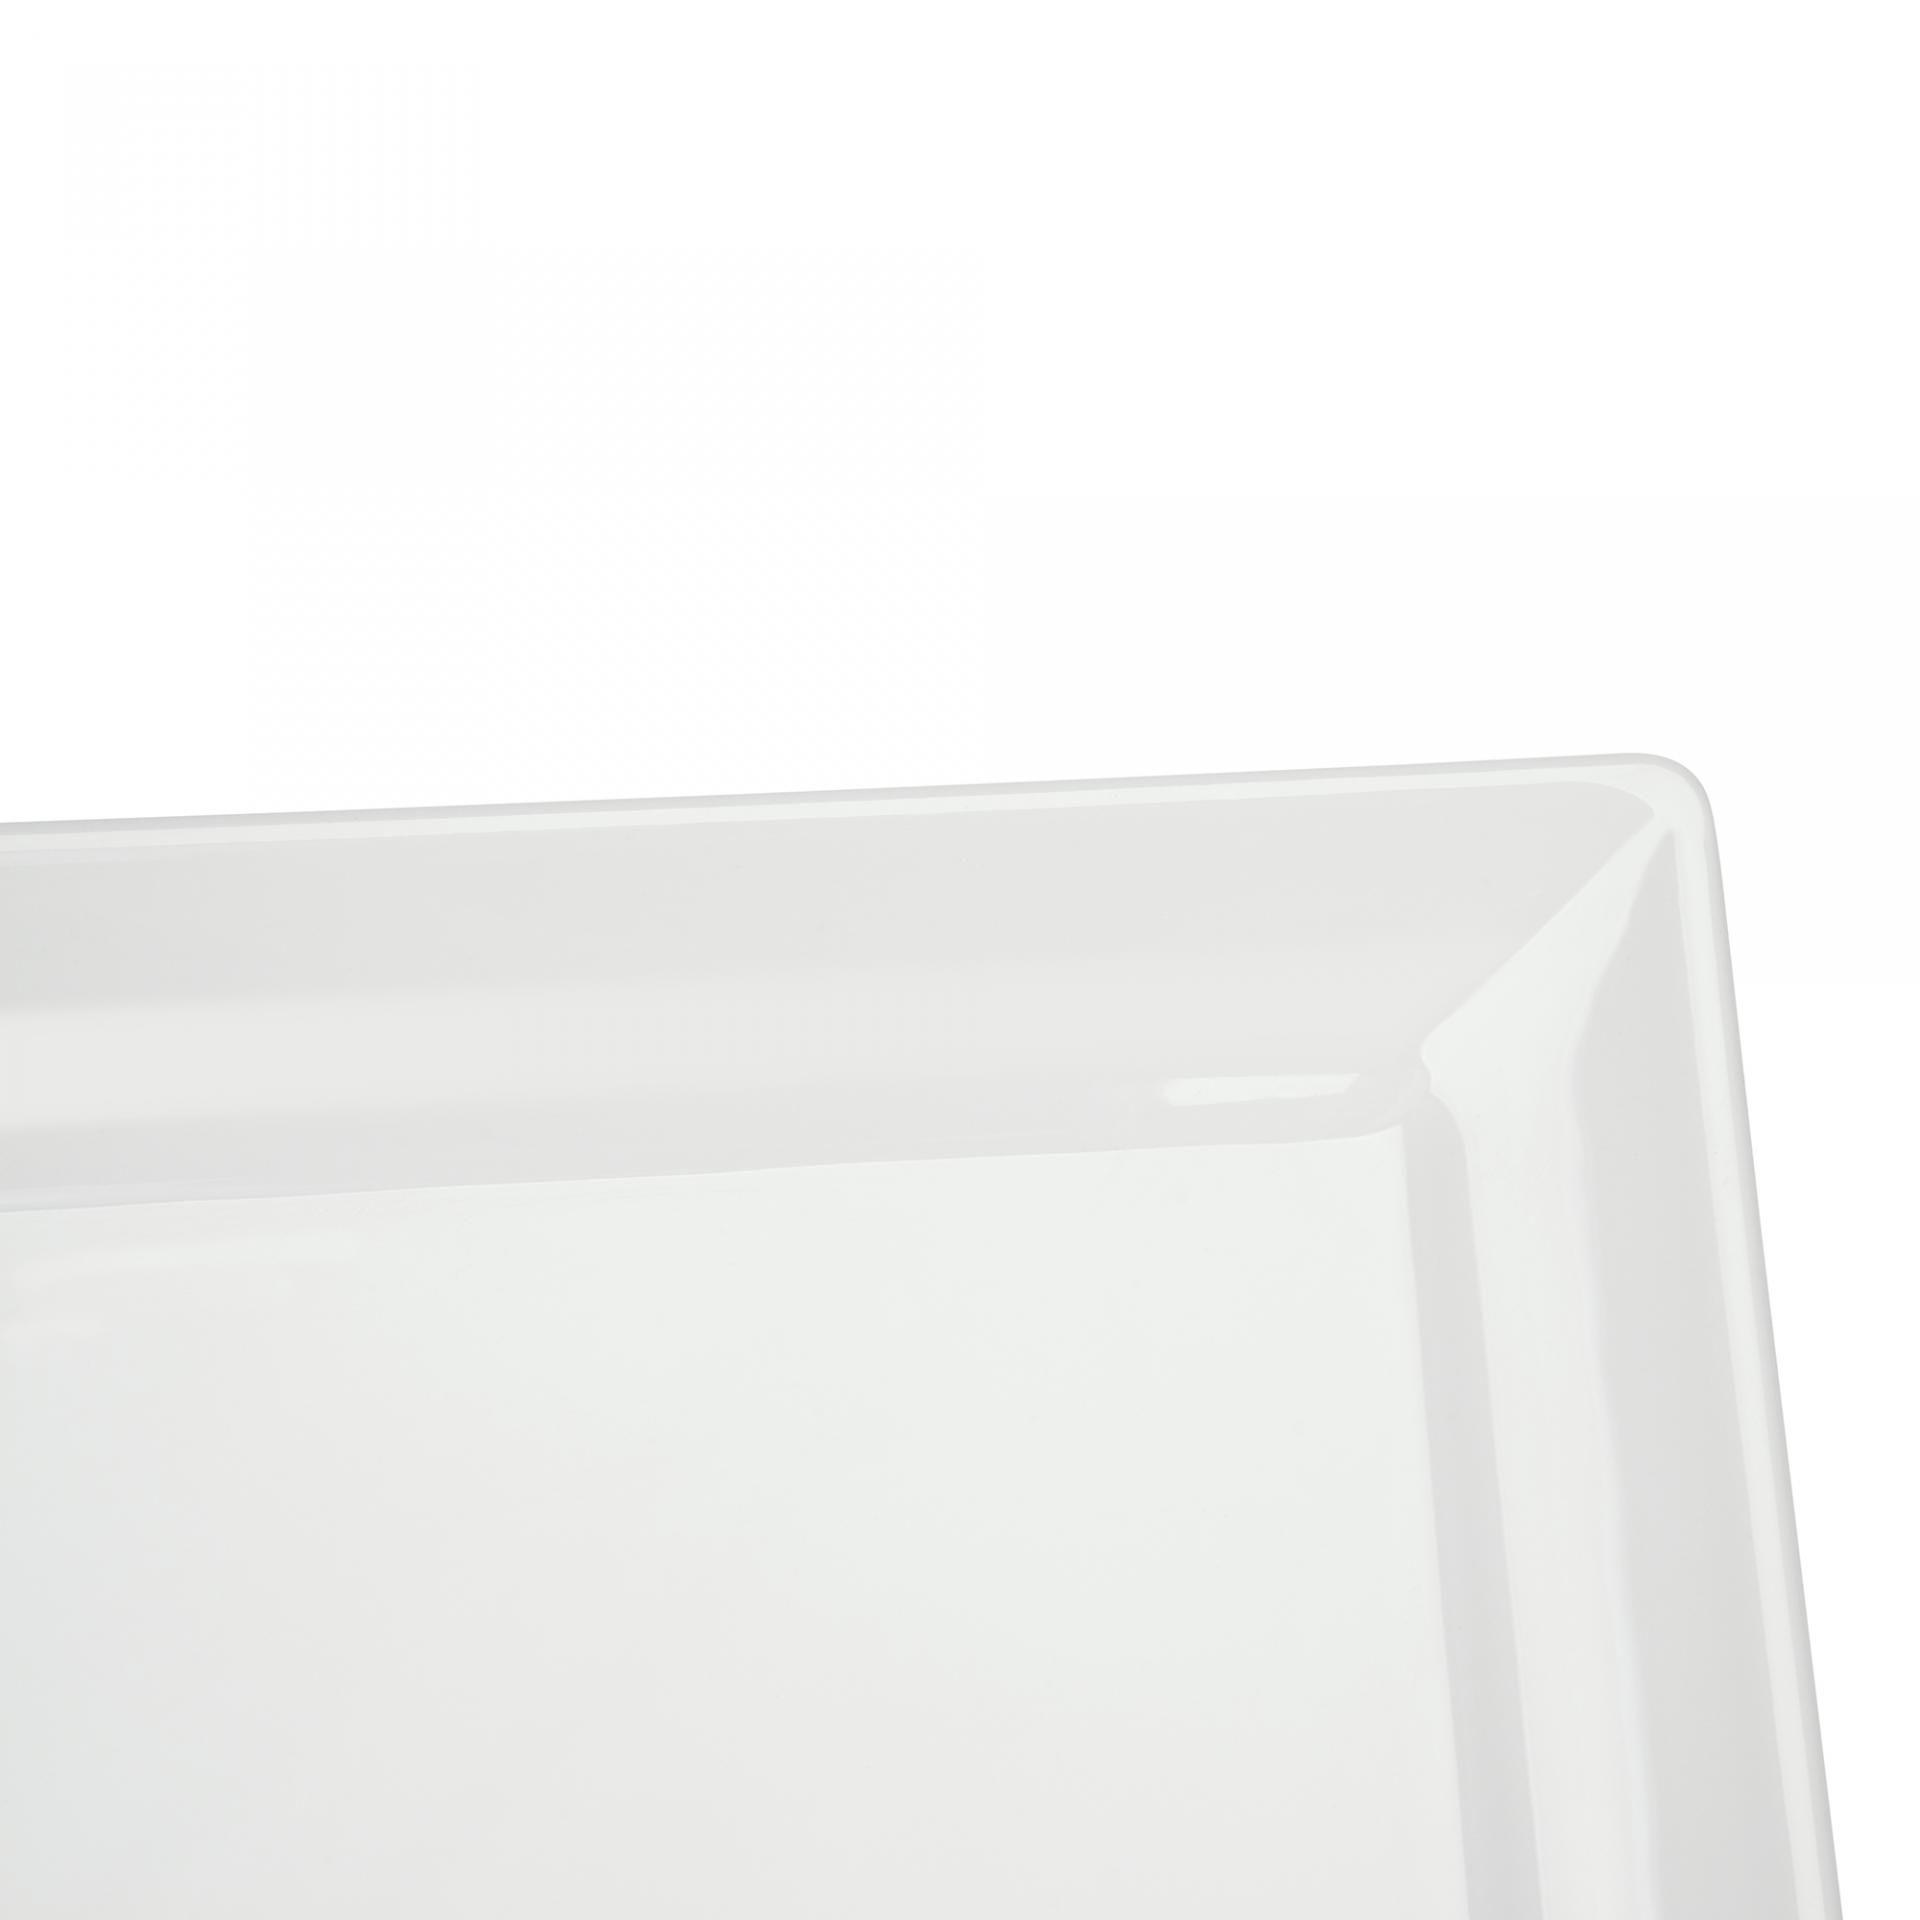 Prato Quadrado Cheff Branco 27Cm Melamina Haus 50501/001